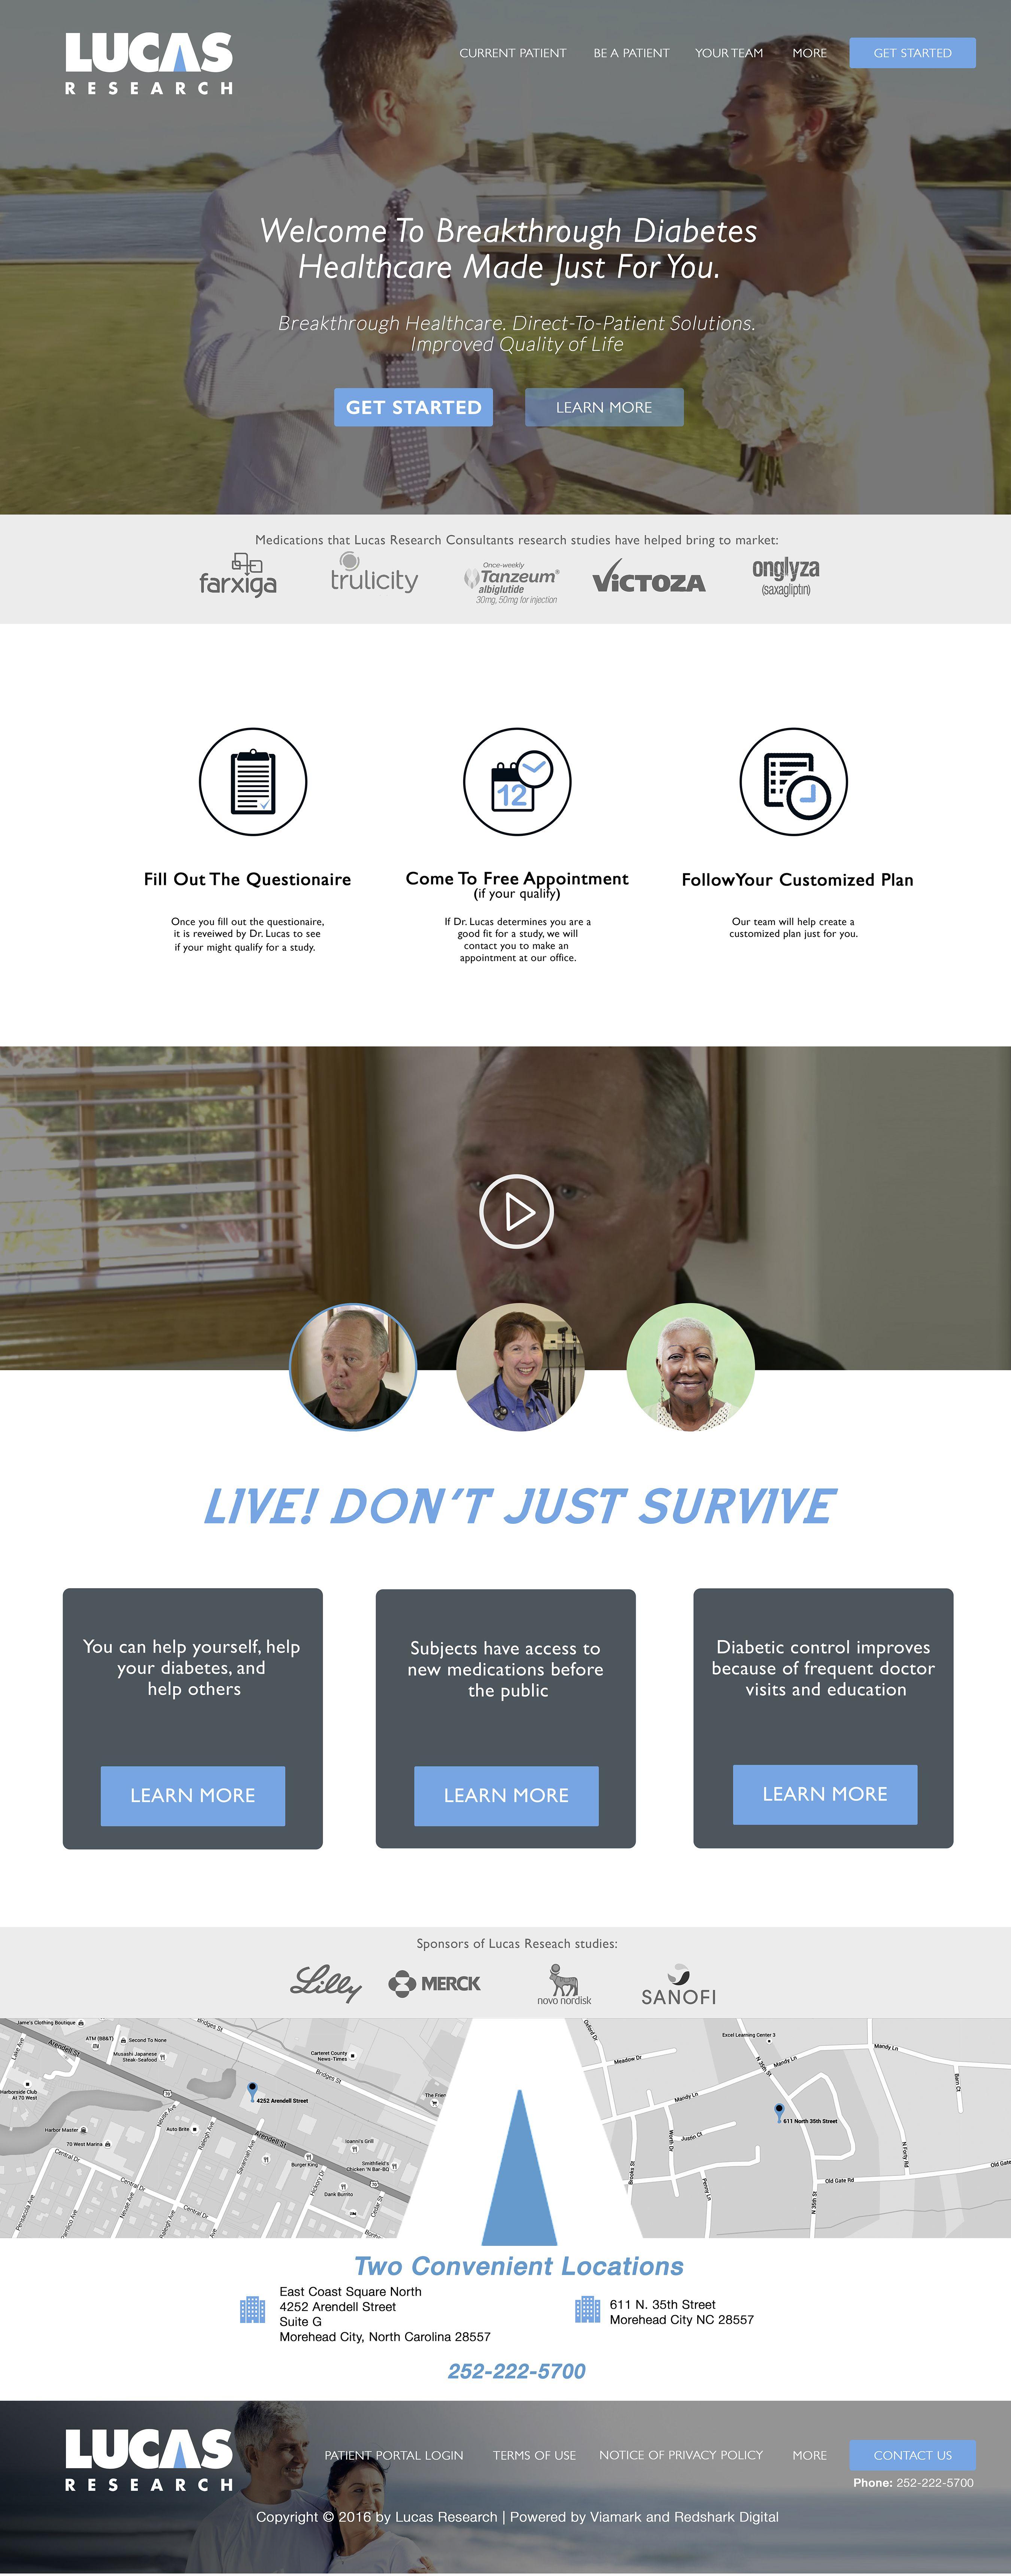 Lucas research web design web